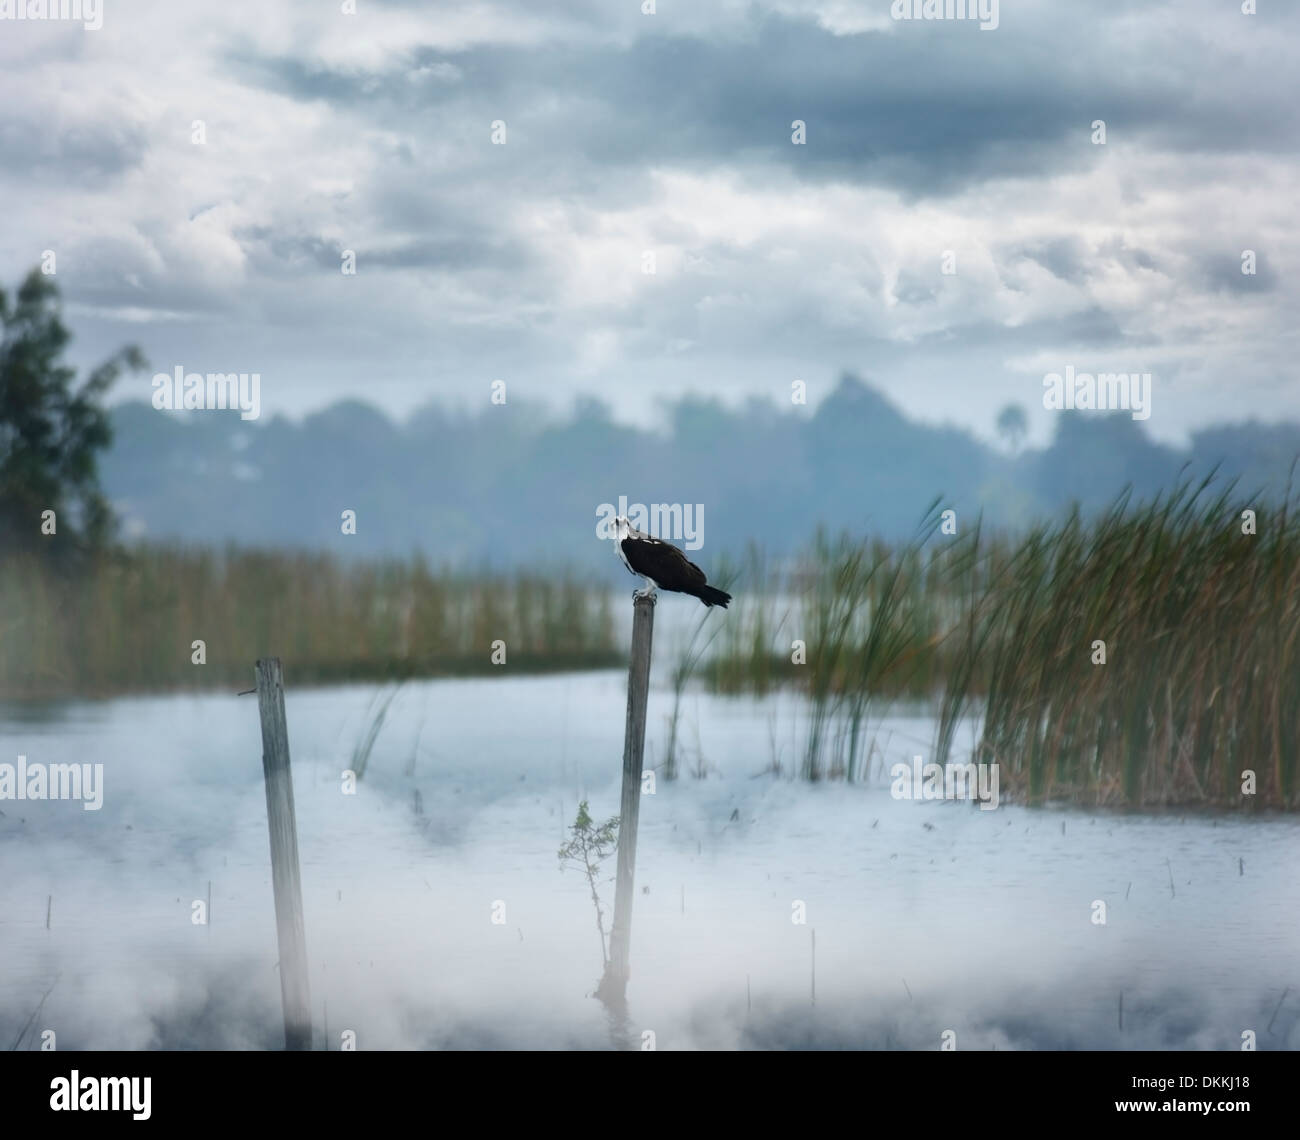 Hawk Perching On A Log At Foggy Morning - Stock Image